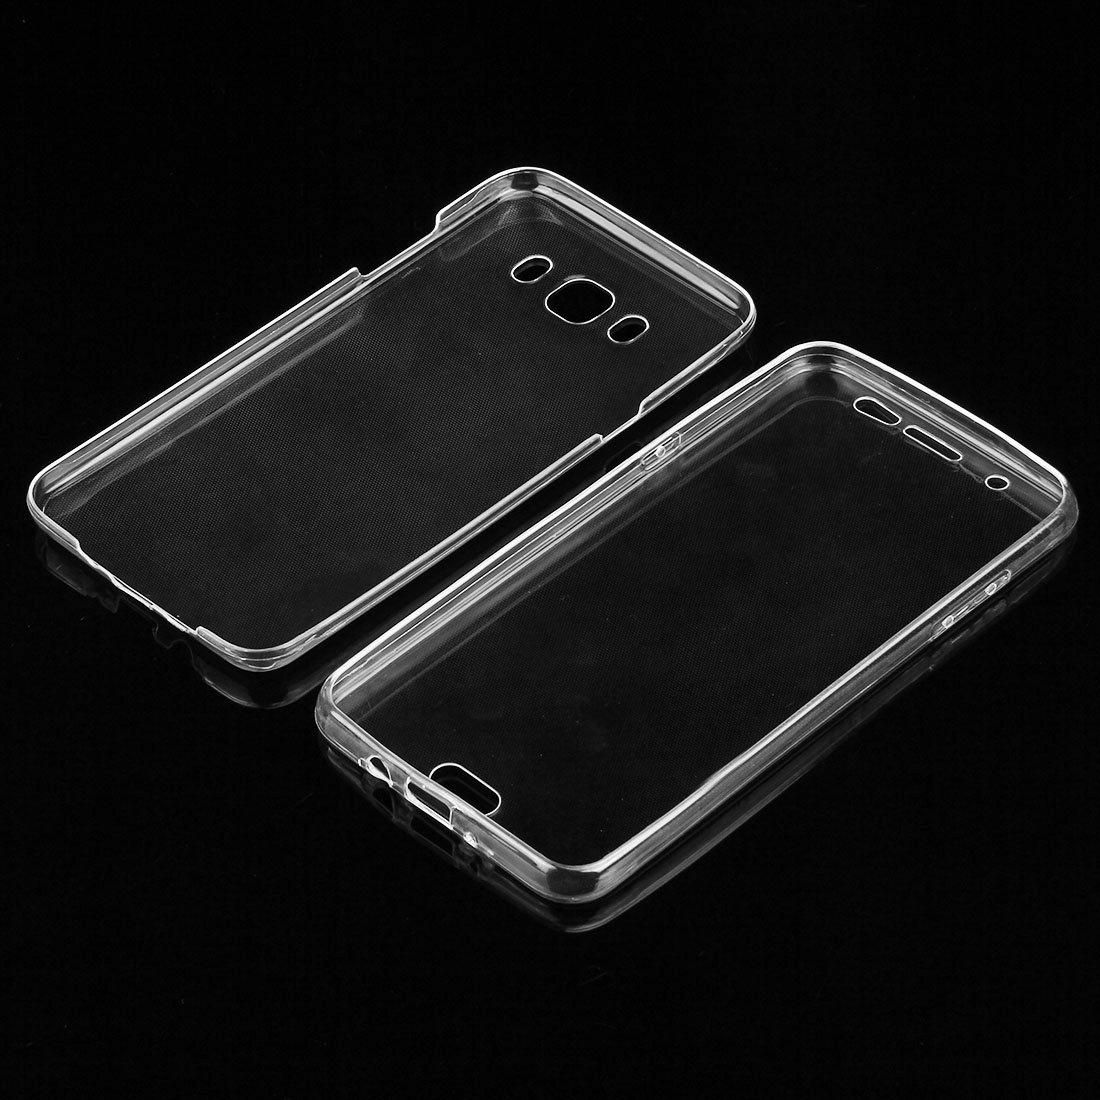 caso Para Samsung Galaxy J7 2016 JIALUN // J710 0,75 mm de doble cara ultrafina TPU transparente caso de protecci/ón Hermoso y pr/áctico